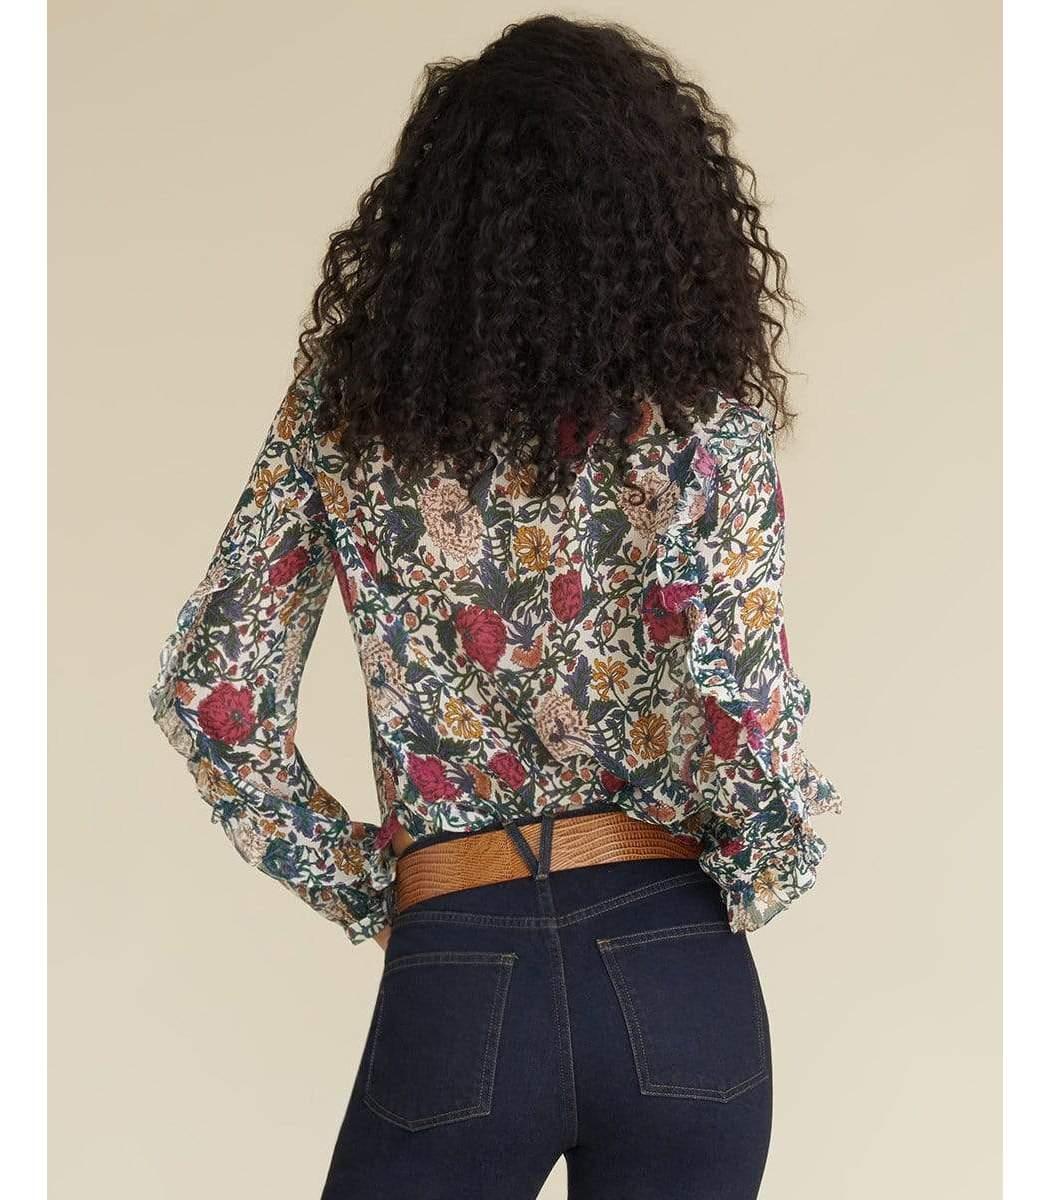 VERONICA BEARD Blouses Abra Floral Blouse